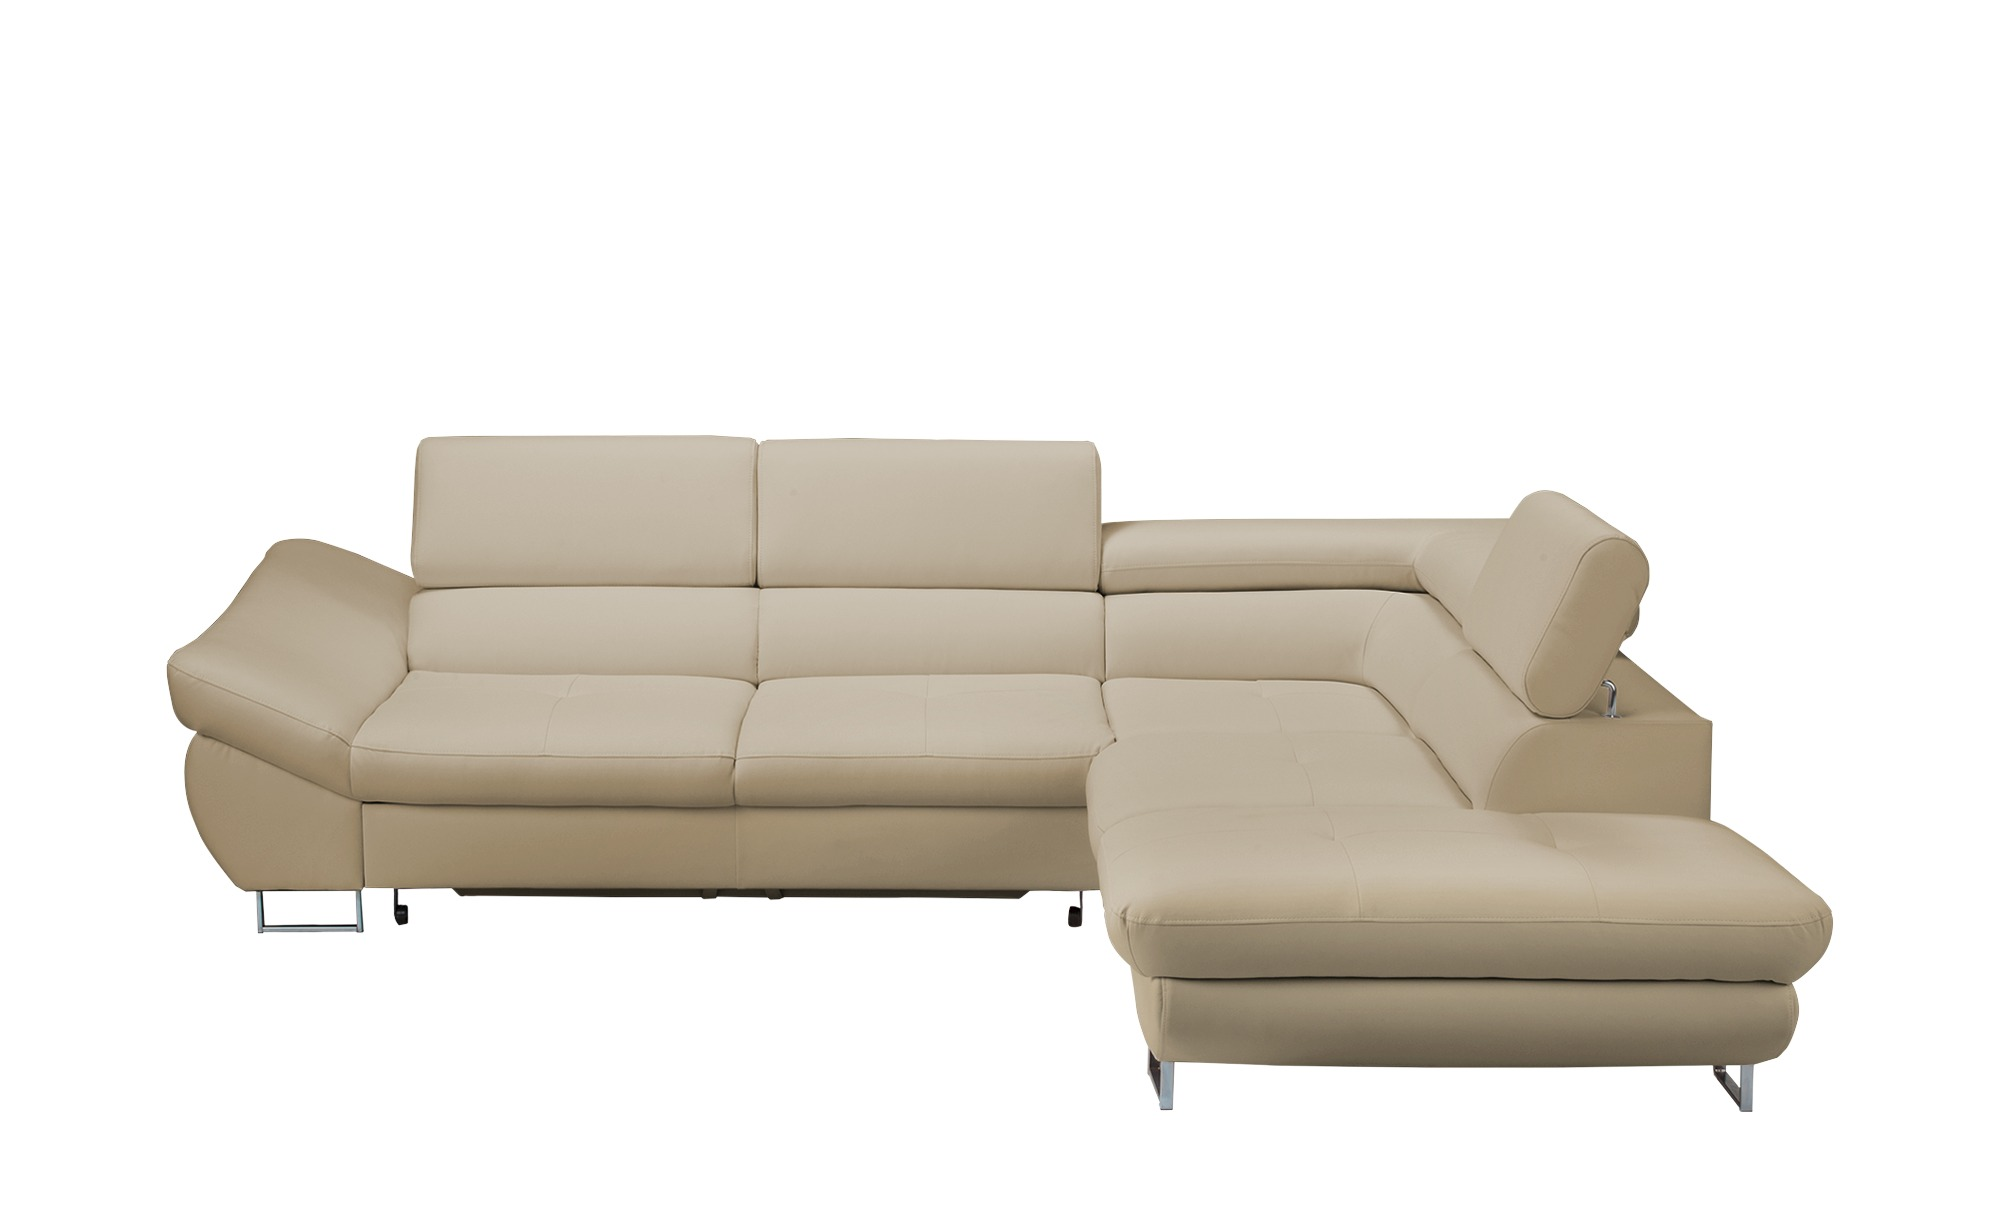 Switch Ecksofa Fabio Gefunden Bei Mobel Hoffner Couch Sofa Decor